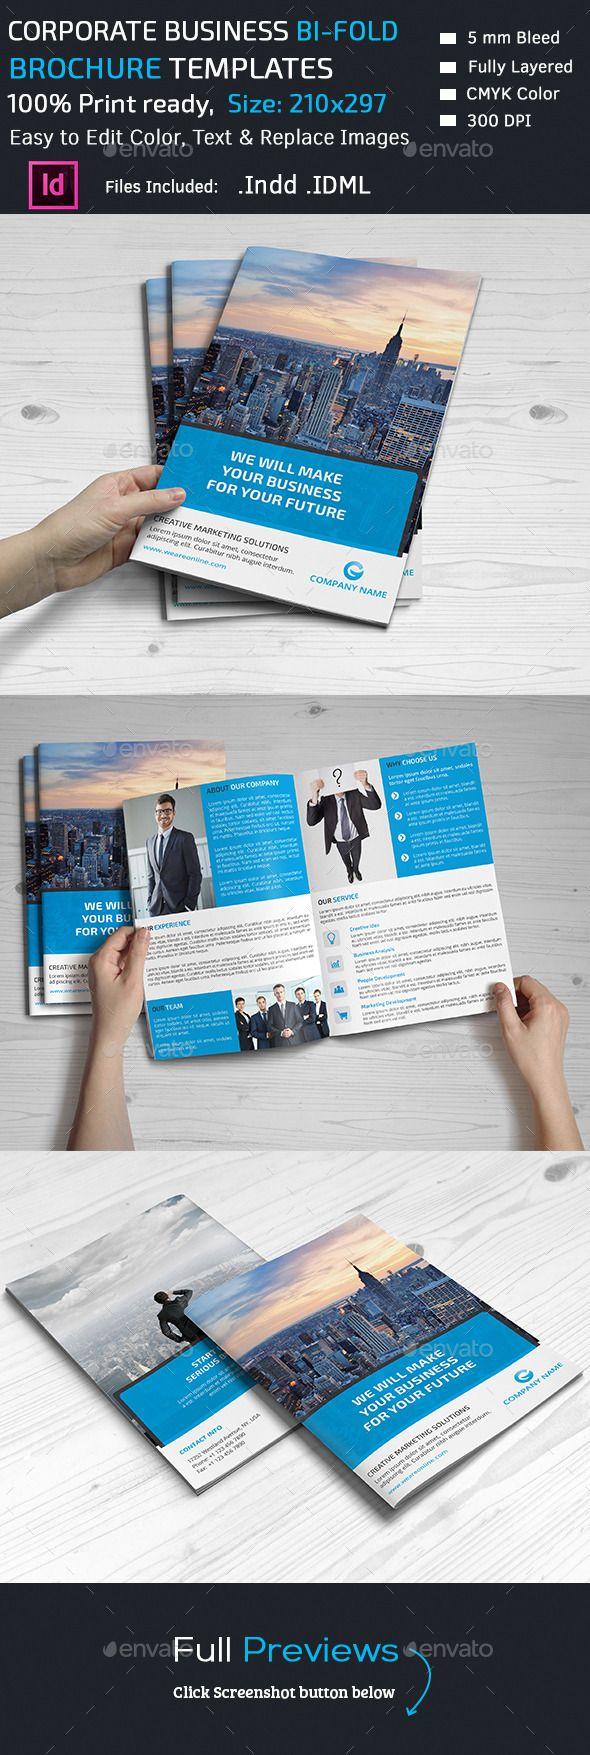 Corporate Brochure - Corporate Brochure Template InDesign INDD ...